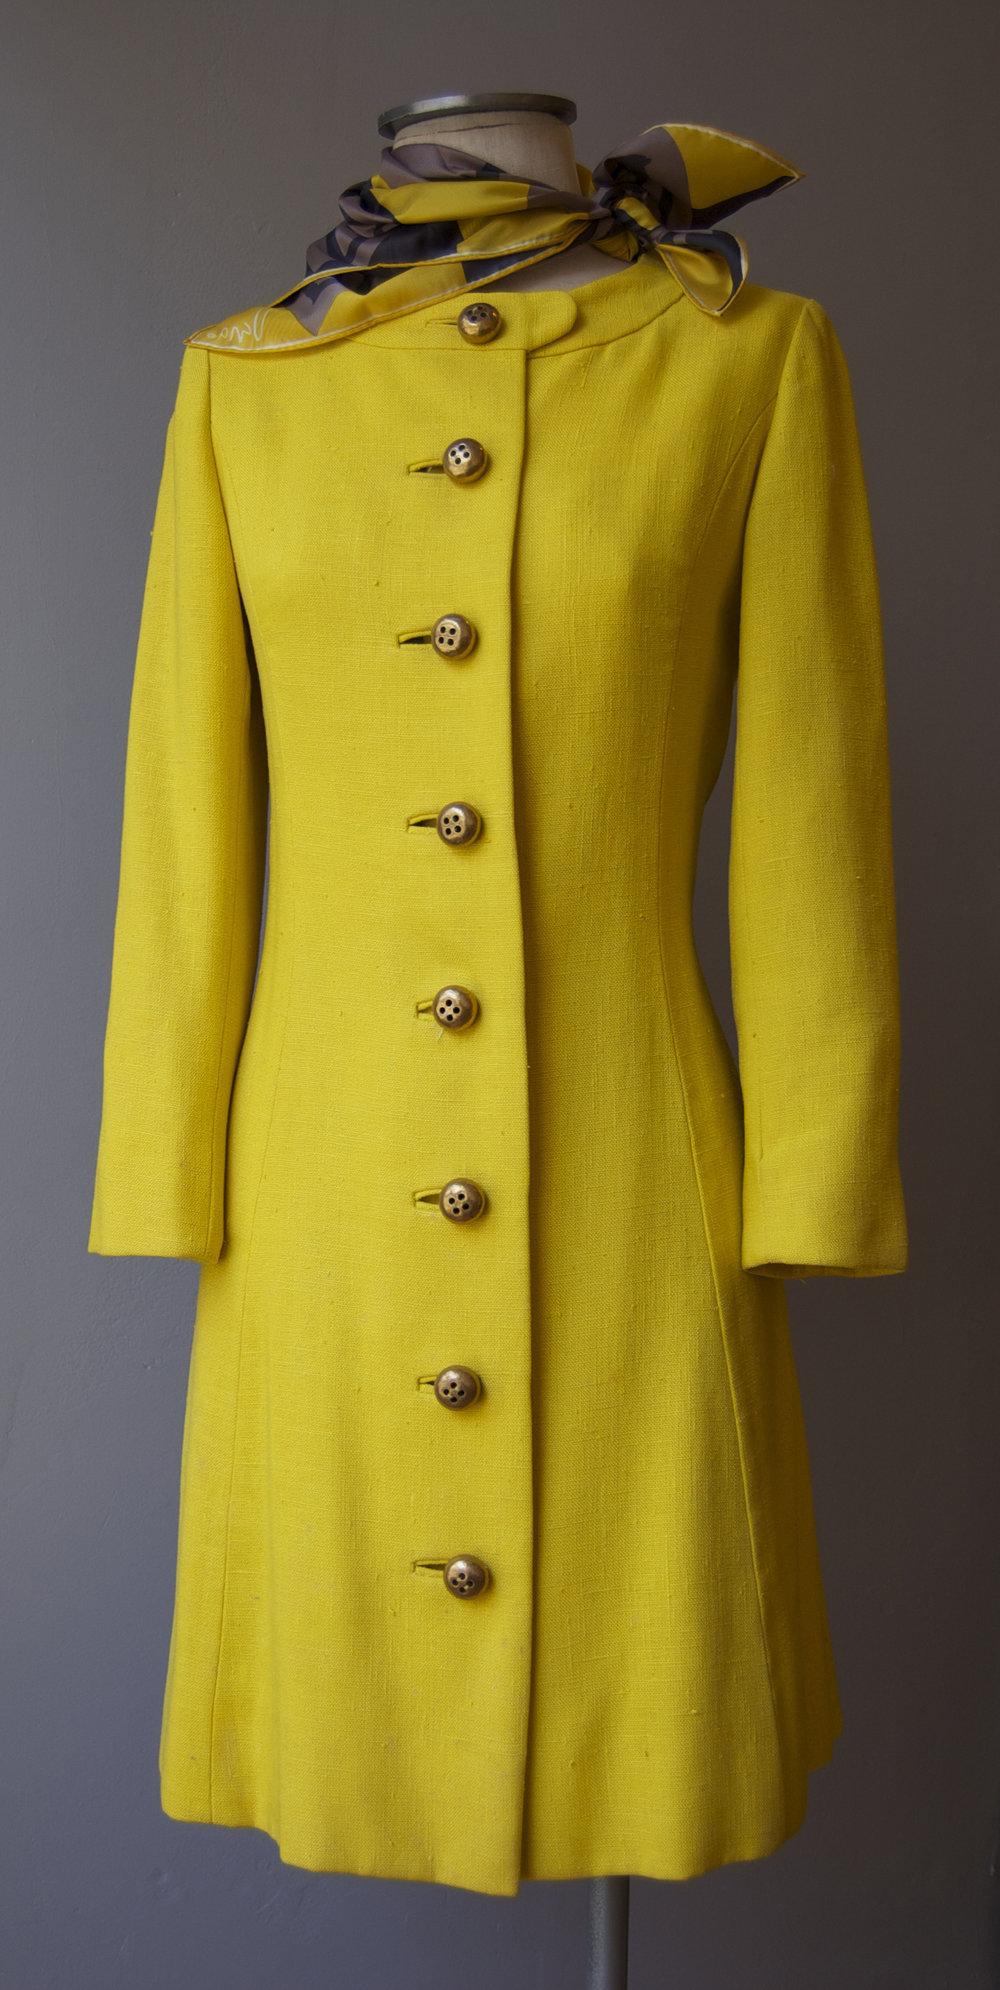 yellowcoatbrassbuttons.jpg